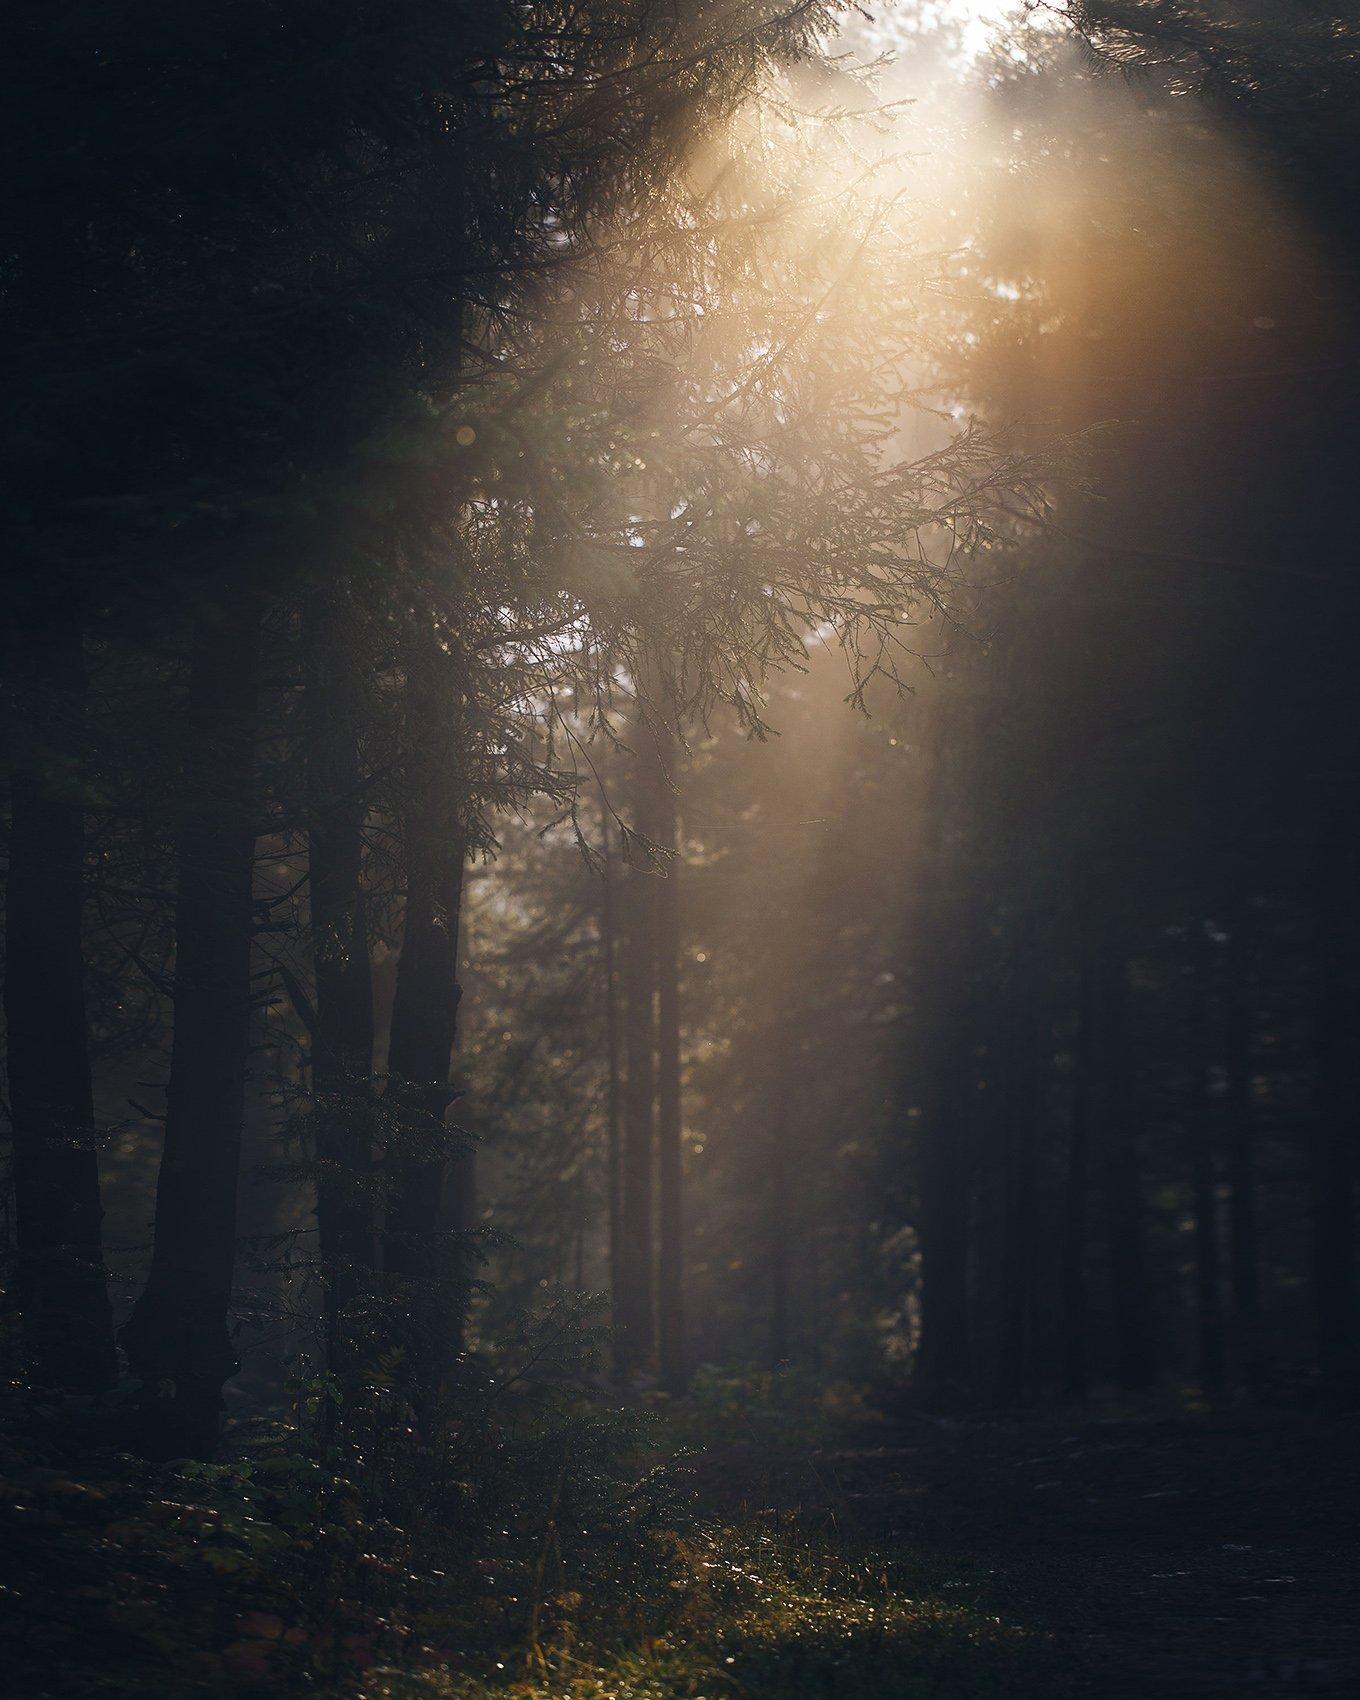 осень, лес, природа, урал, златоуст, туман, Евгений Толкачёв